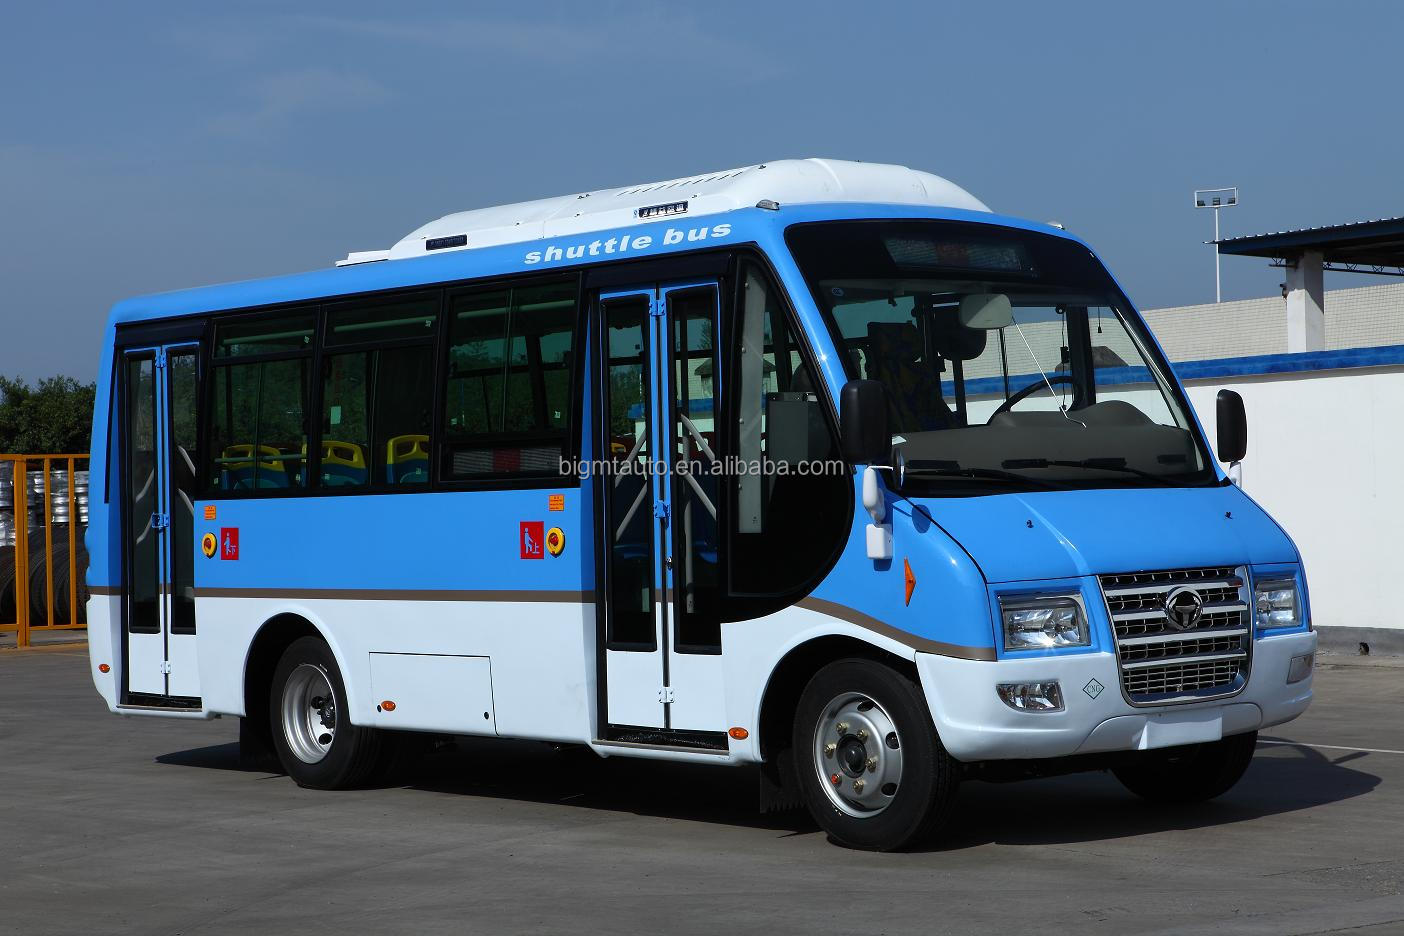 China Passenger Bus Manufacturers Sell 2+2 Seat Layout 22 Seats ...